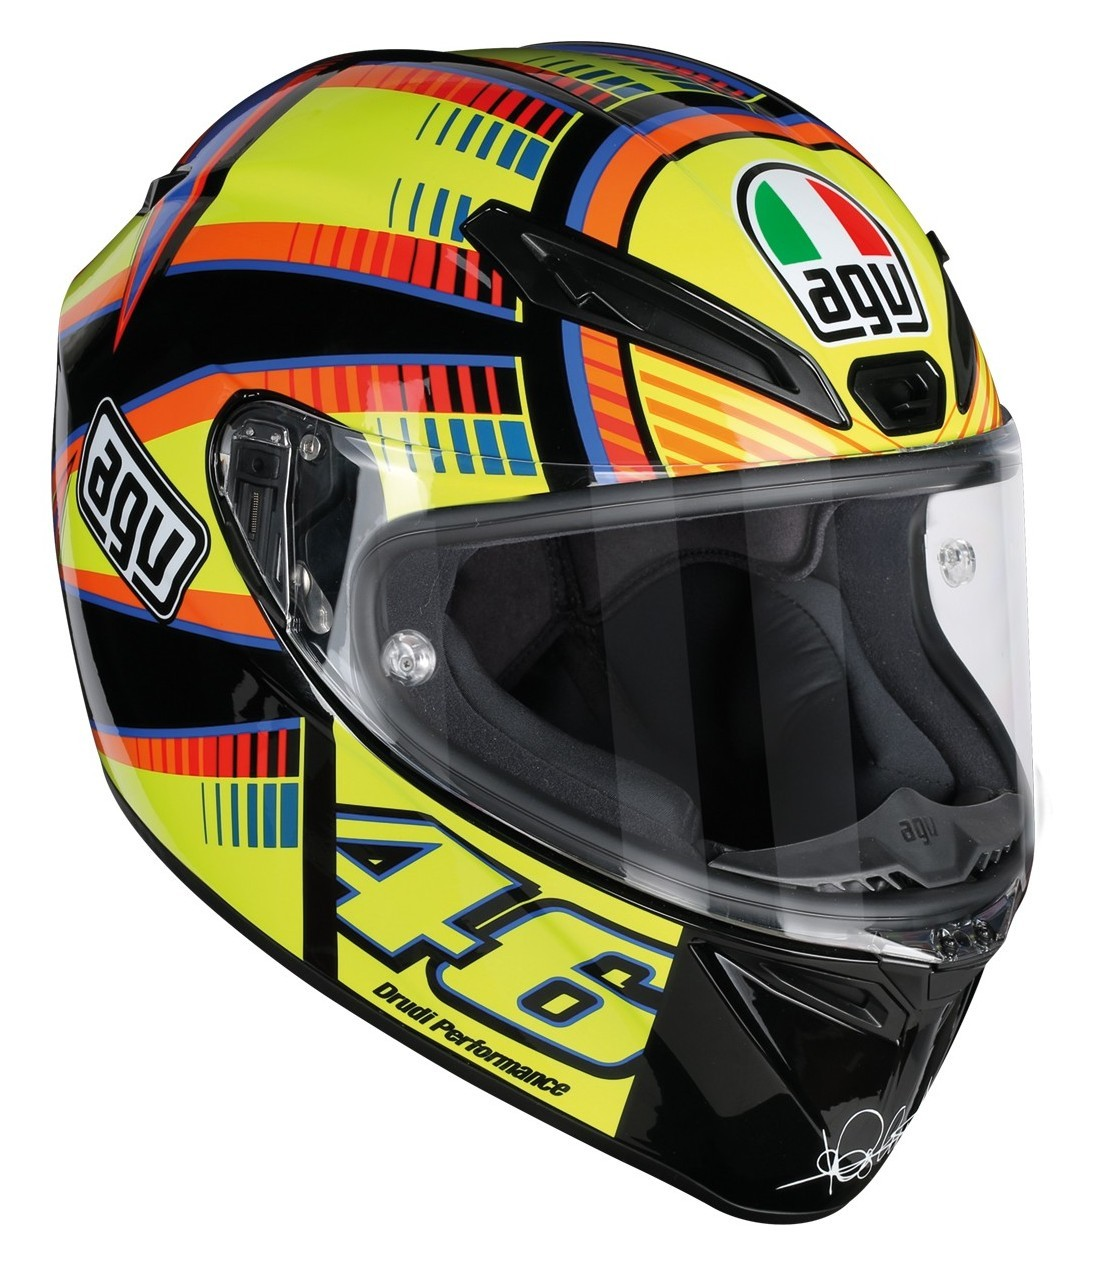 Capacete AGV Veloce Soleluna Valentino Rossi Oficial  - Planet Bike Shop Moto Acessórios